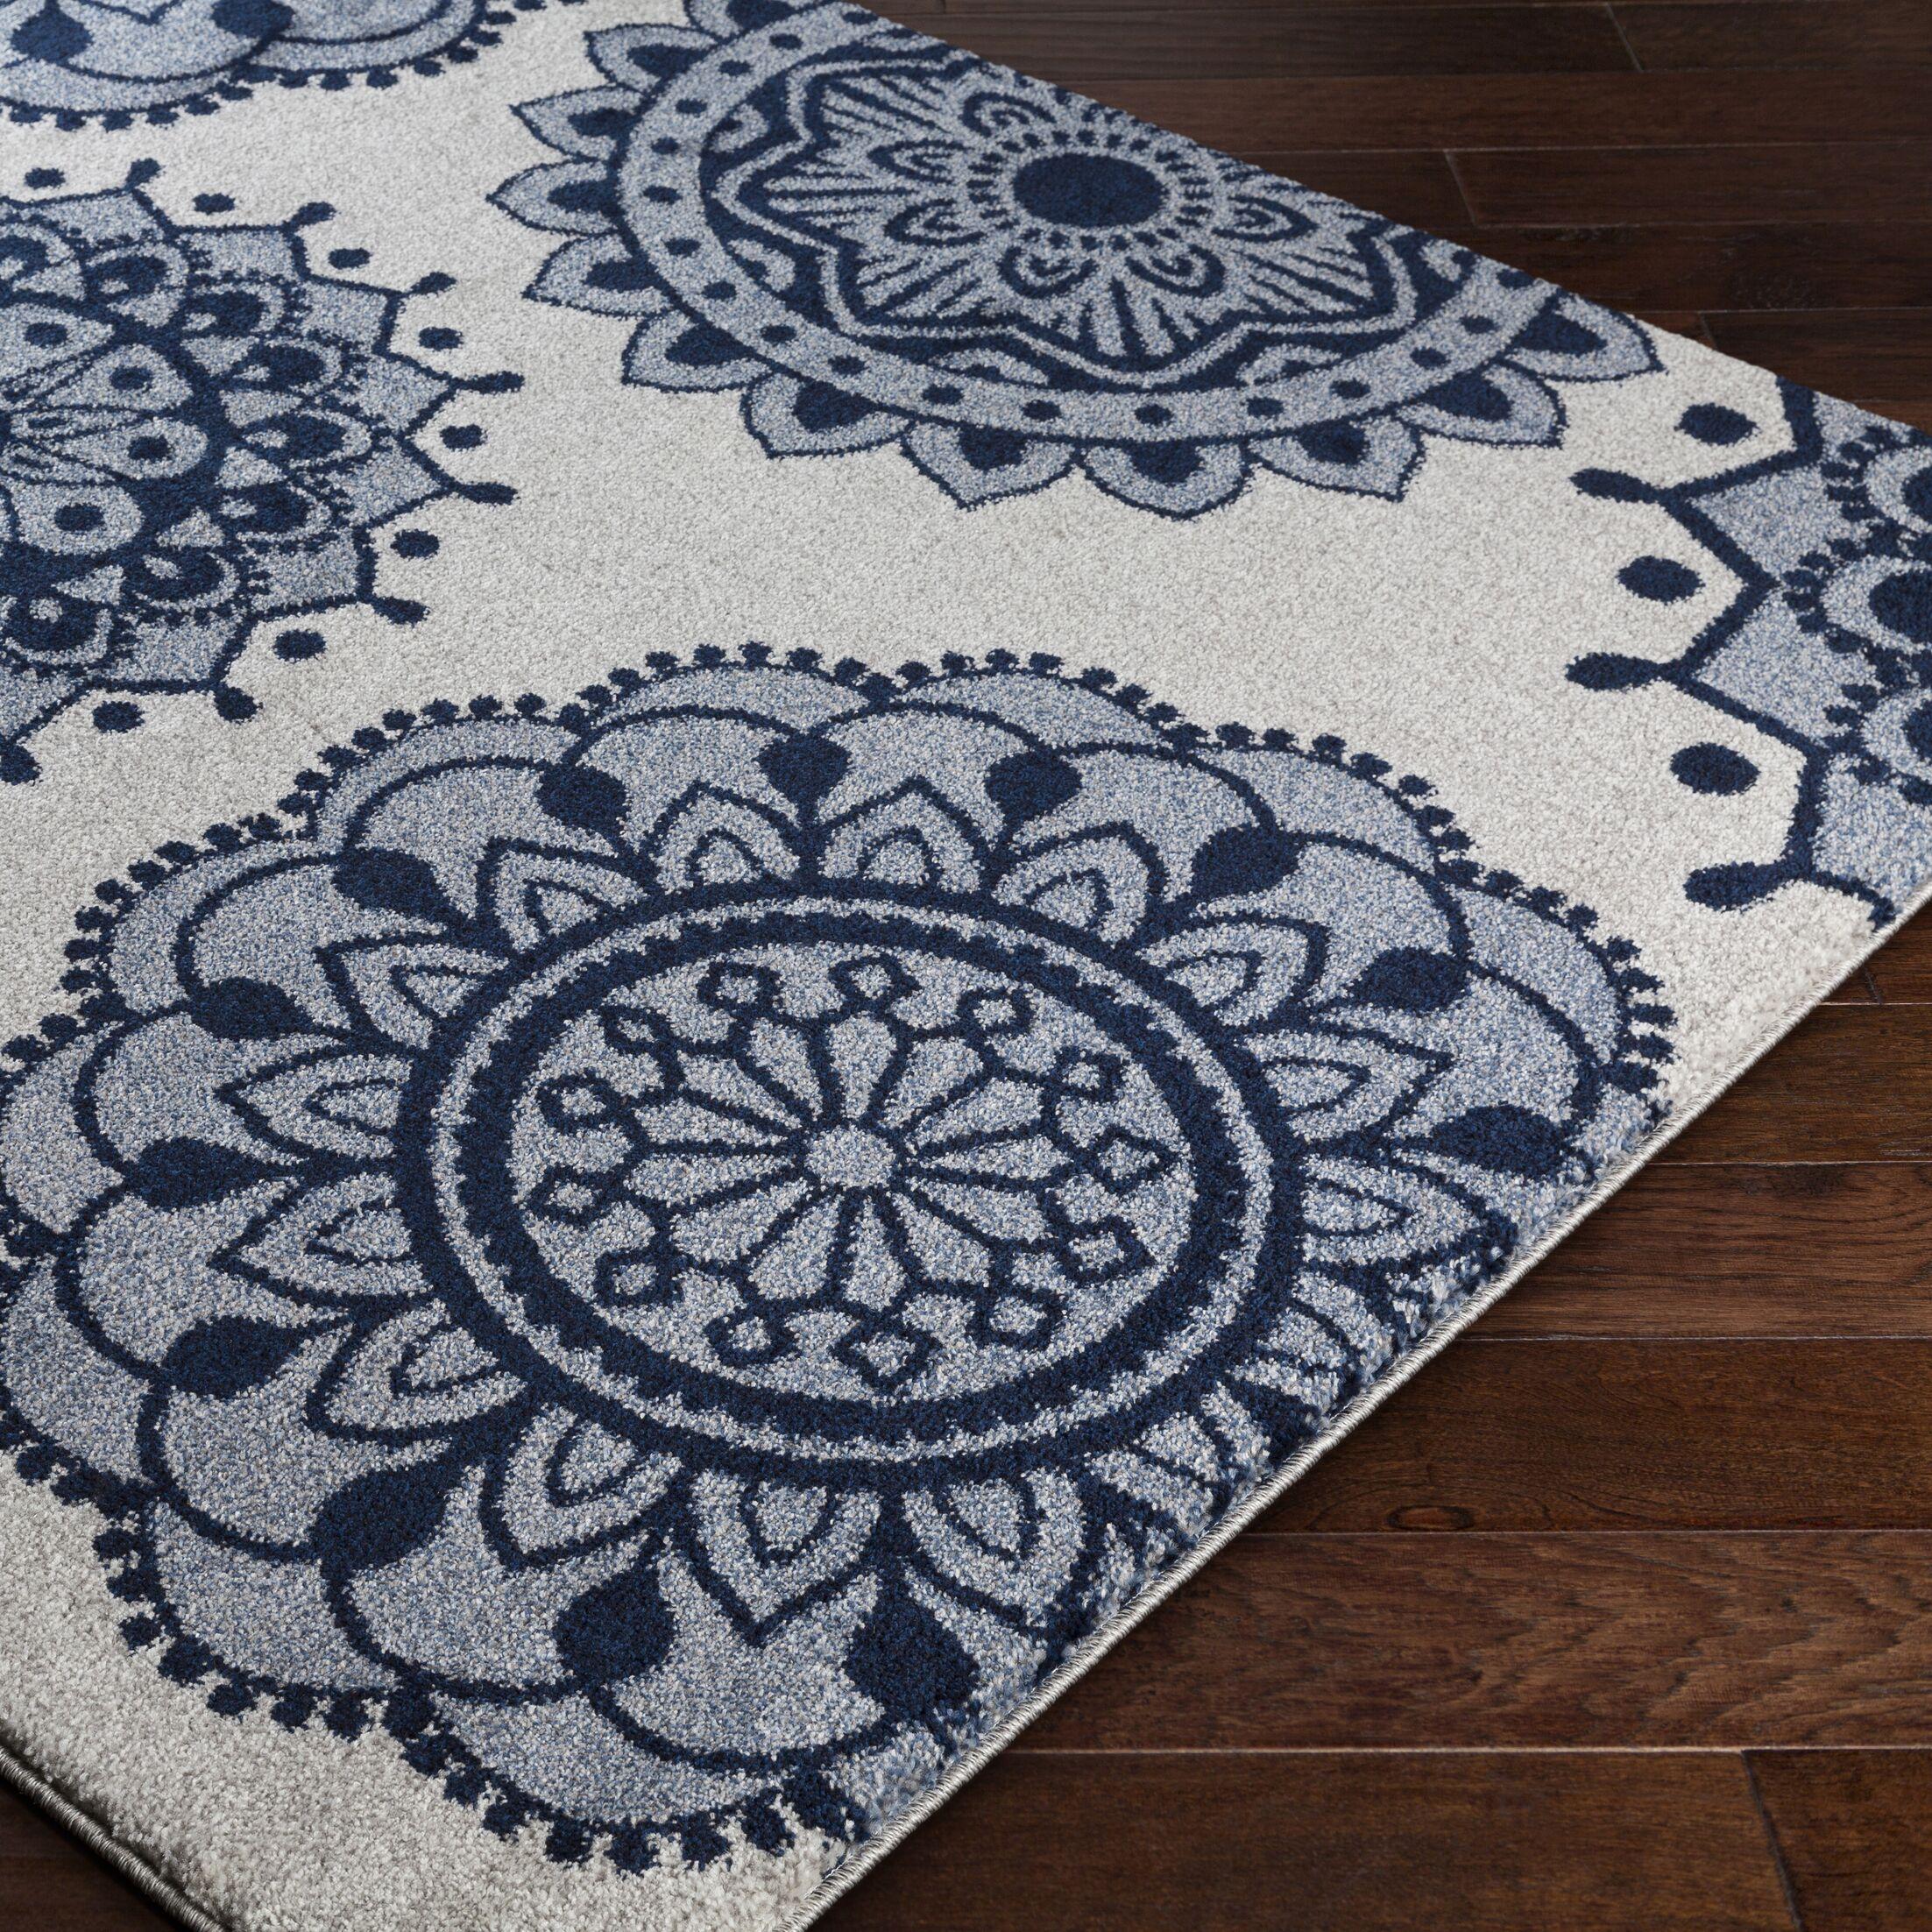 Gravesham Blue/Gray Area Rug Rug Size: Rectangle 5'3